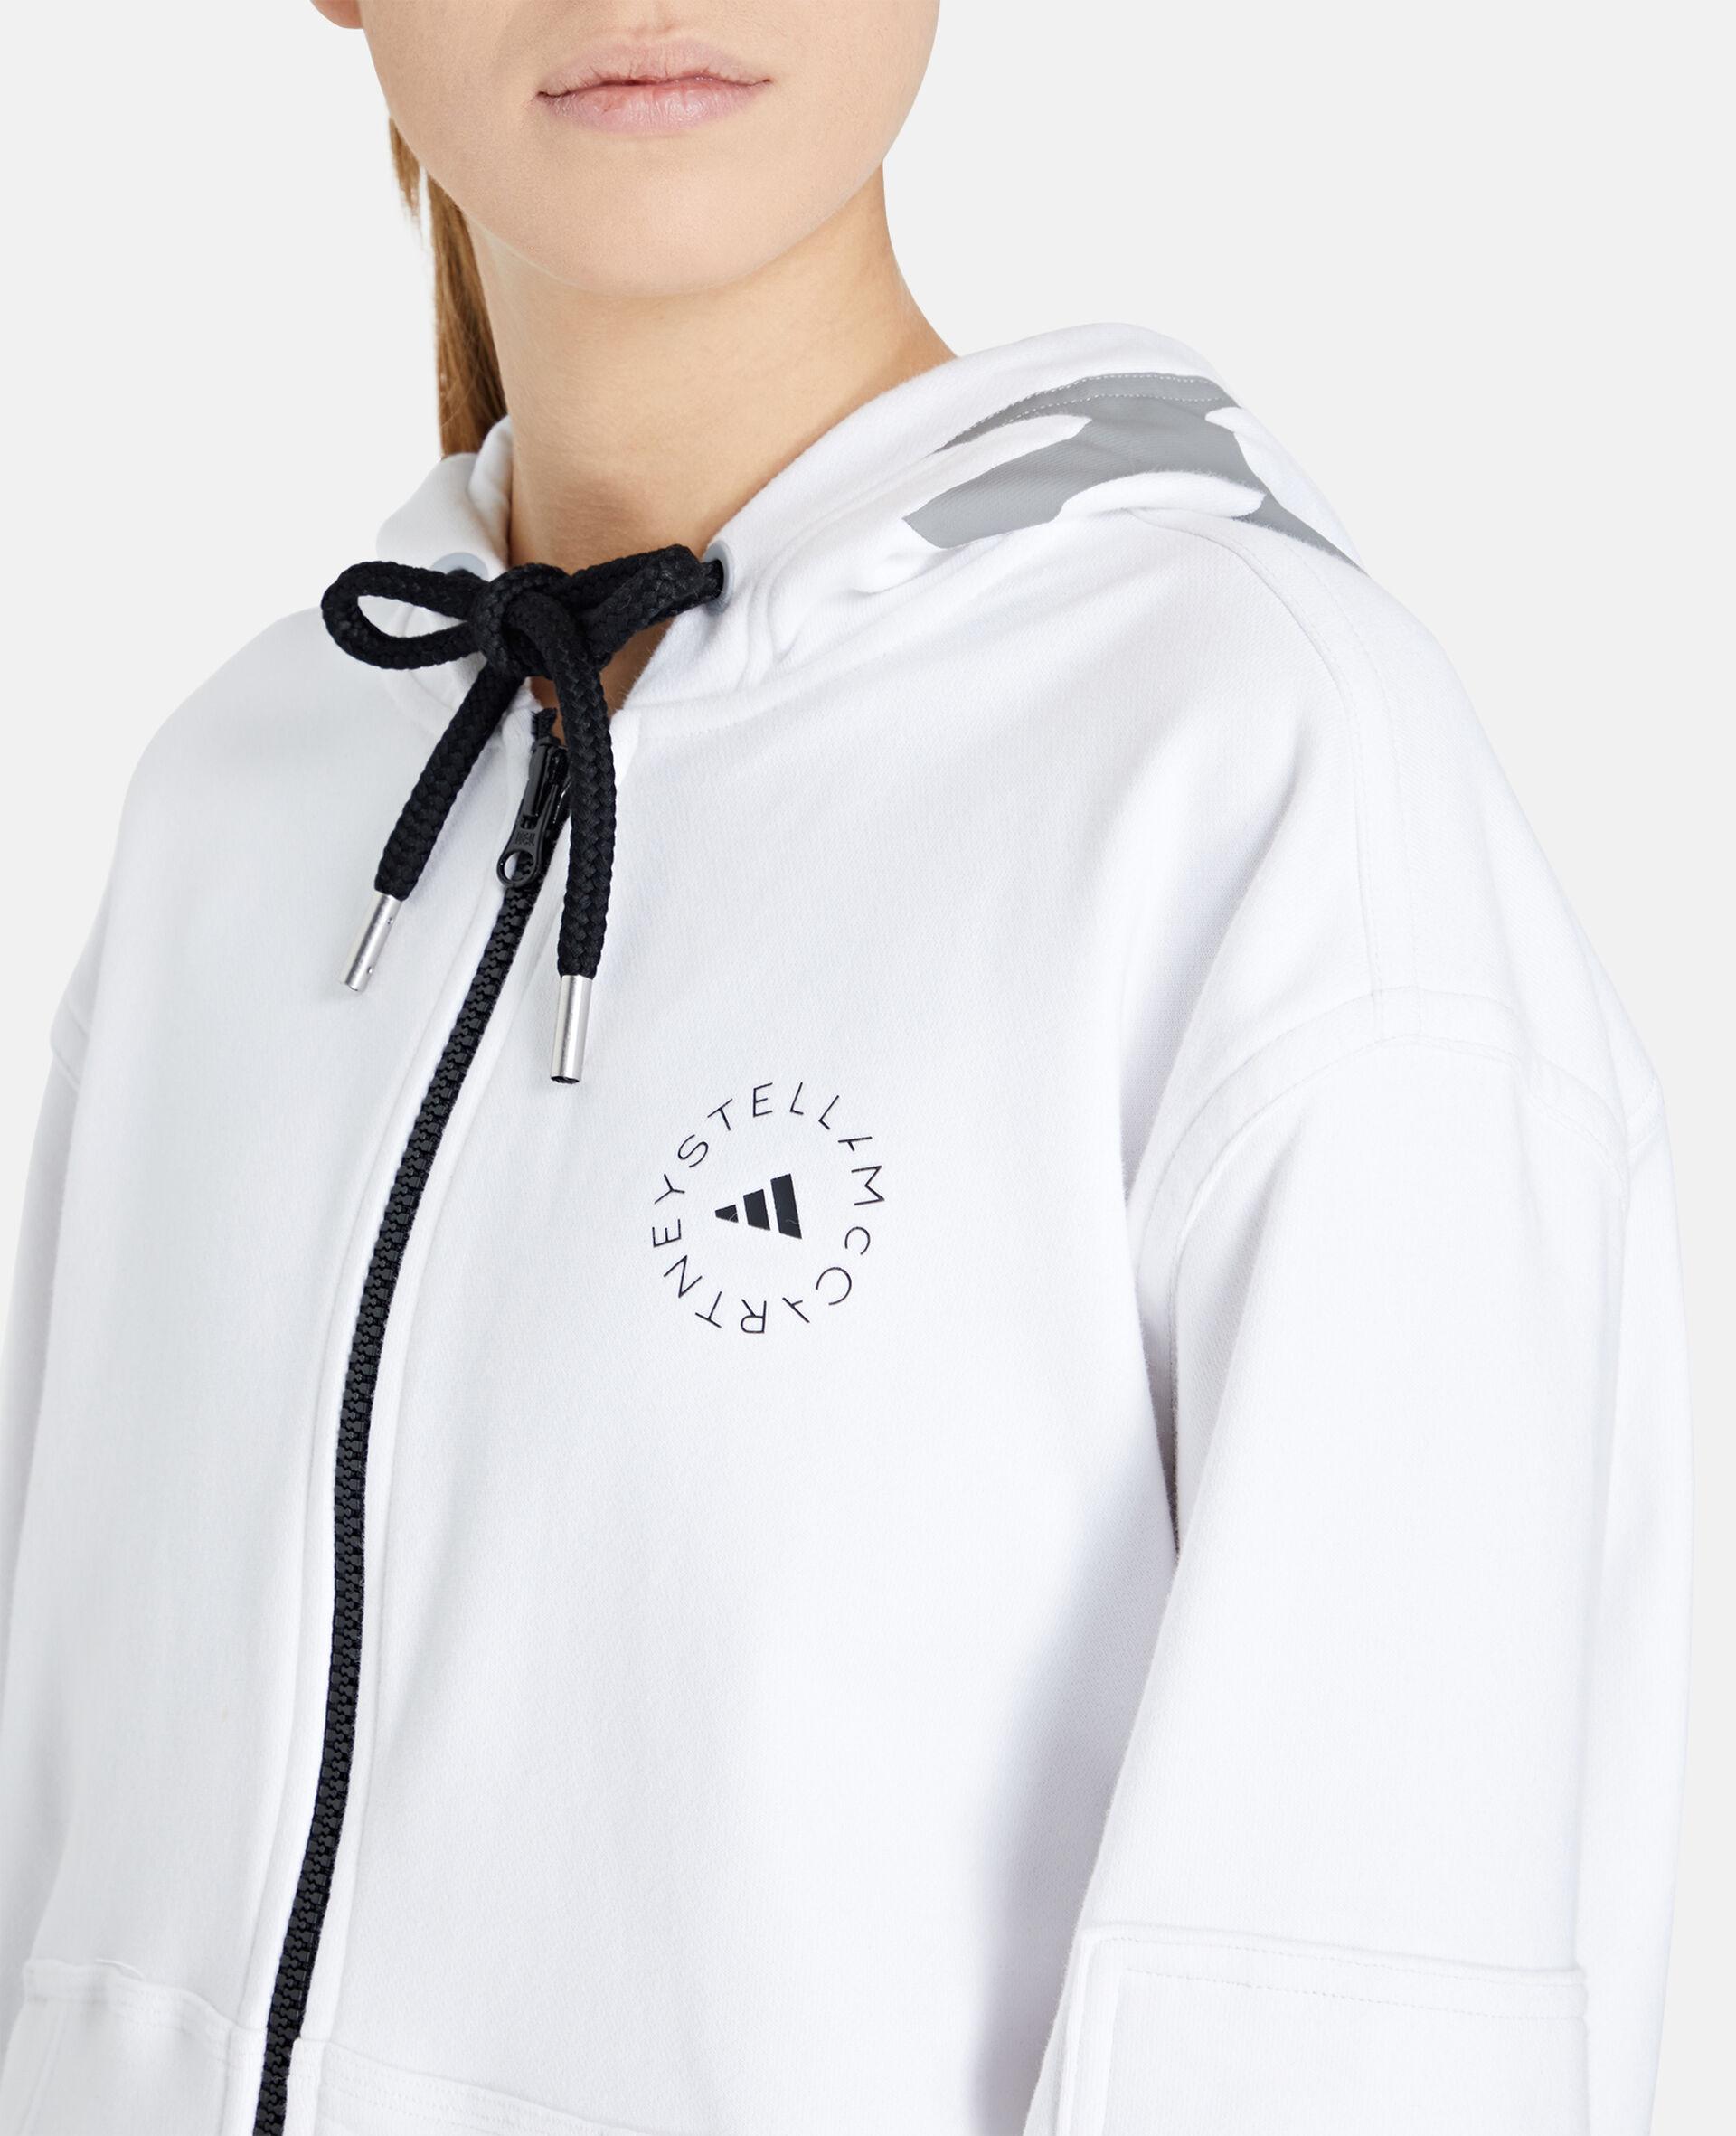 White Full-zipper Hoodie-White-large image number 3